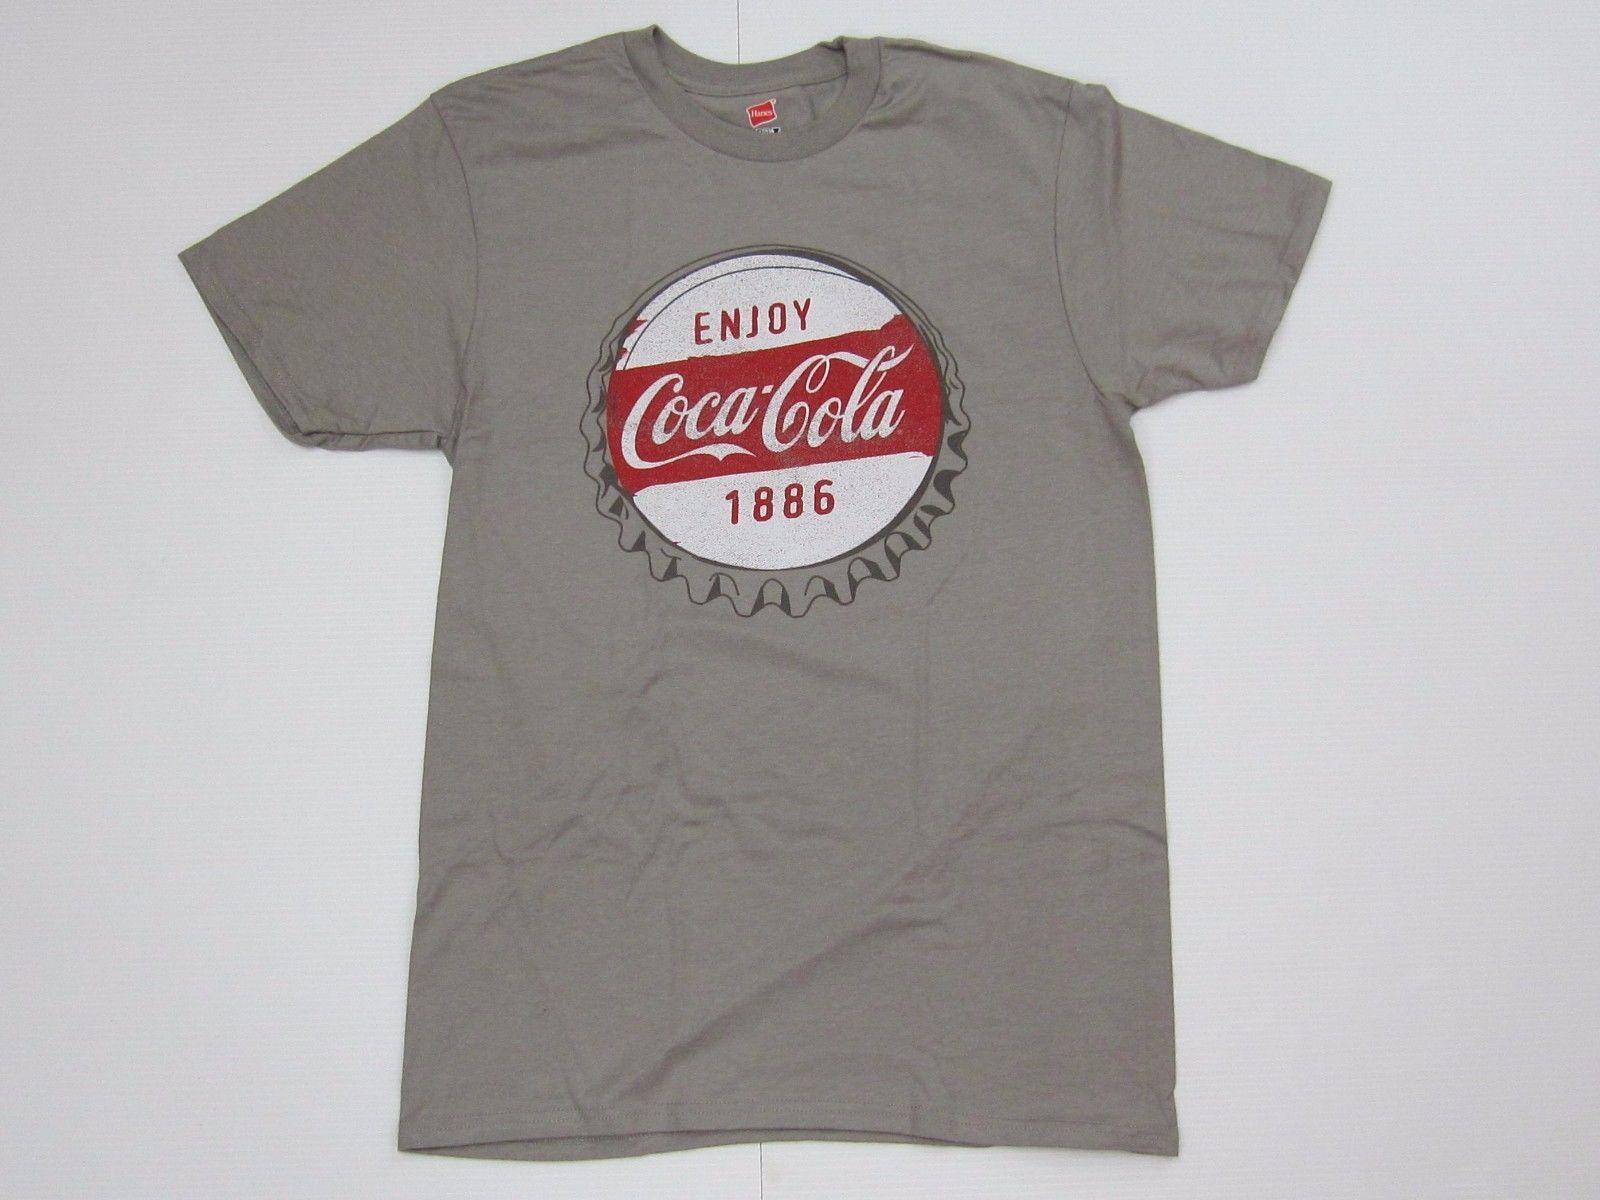 Coca-Cola Black T-shirt Tee Size 4XL 4X-Large Taste of Summer  100/% Cotton